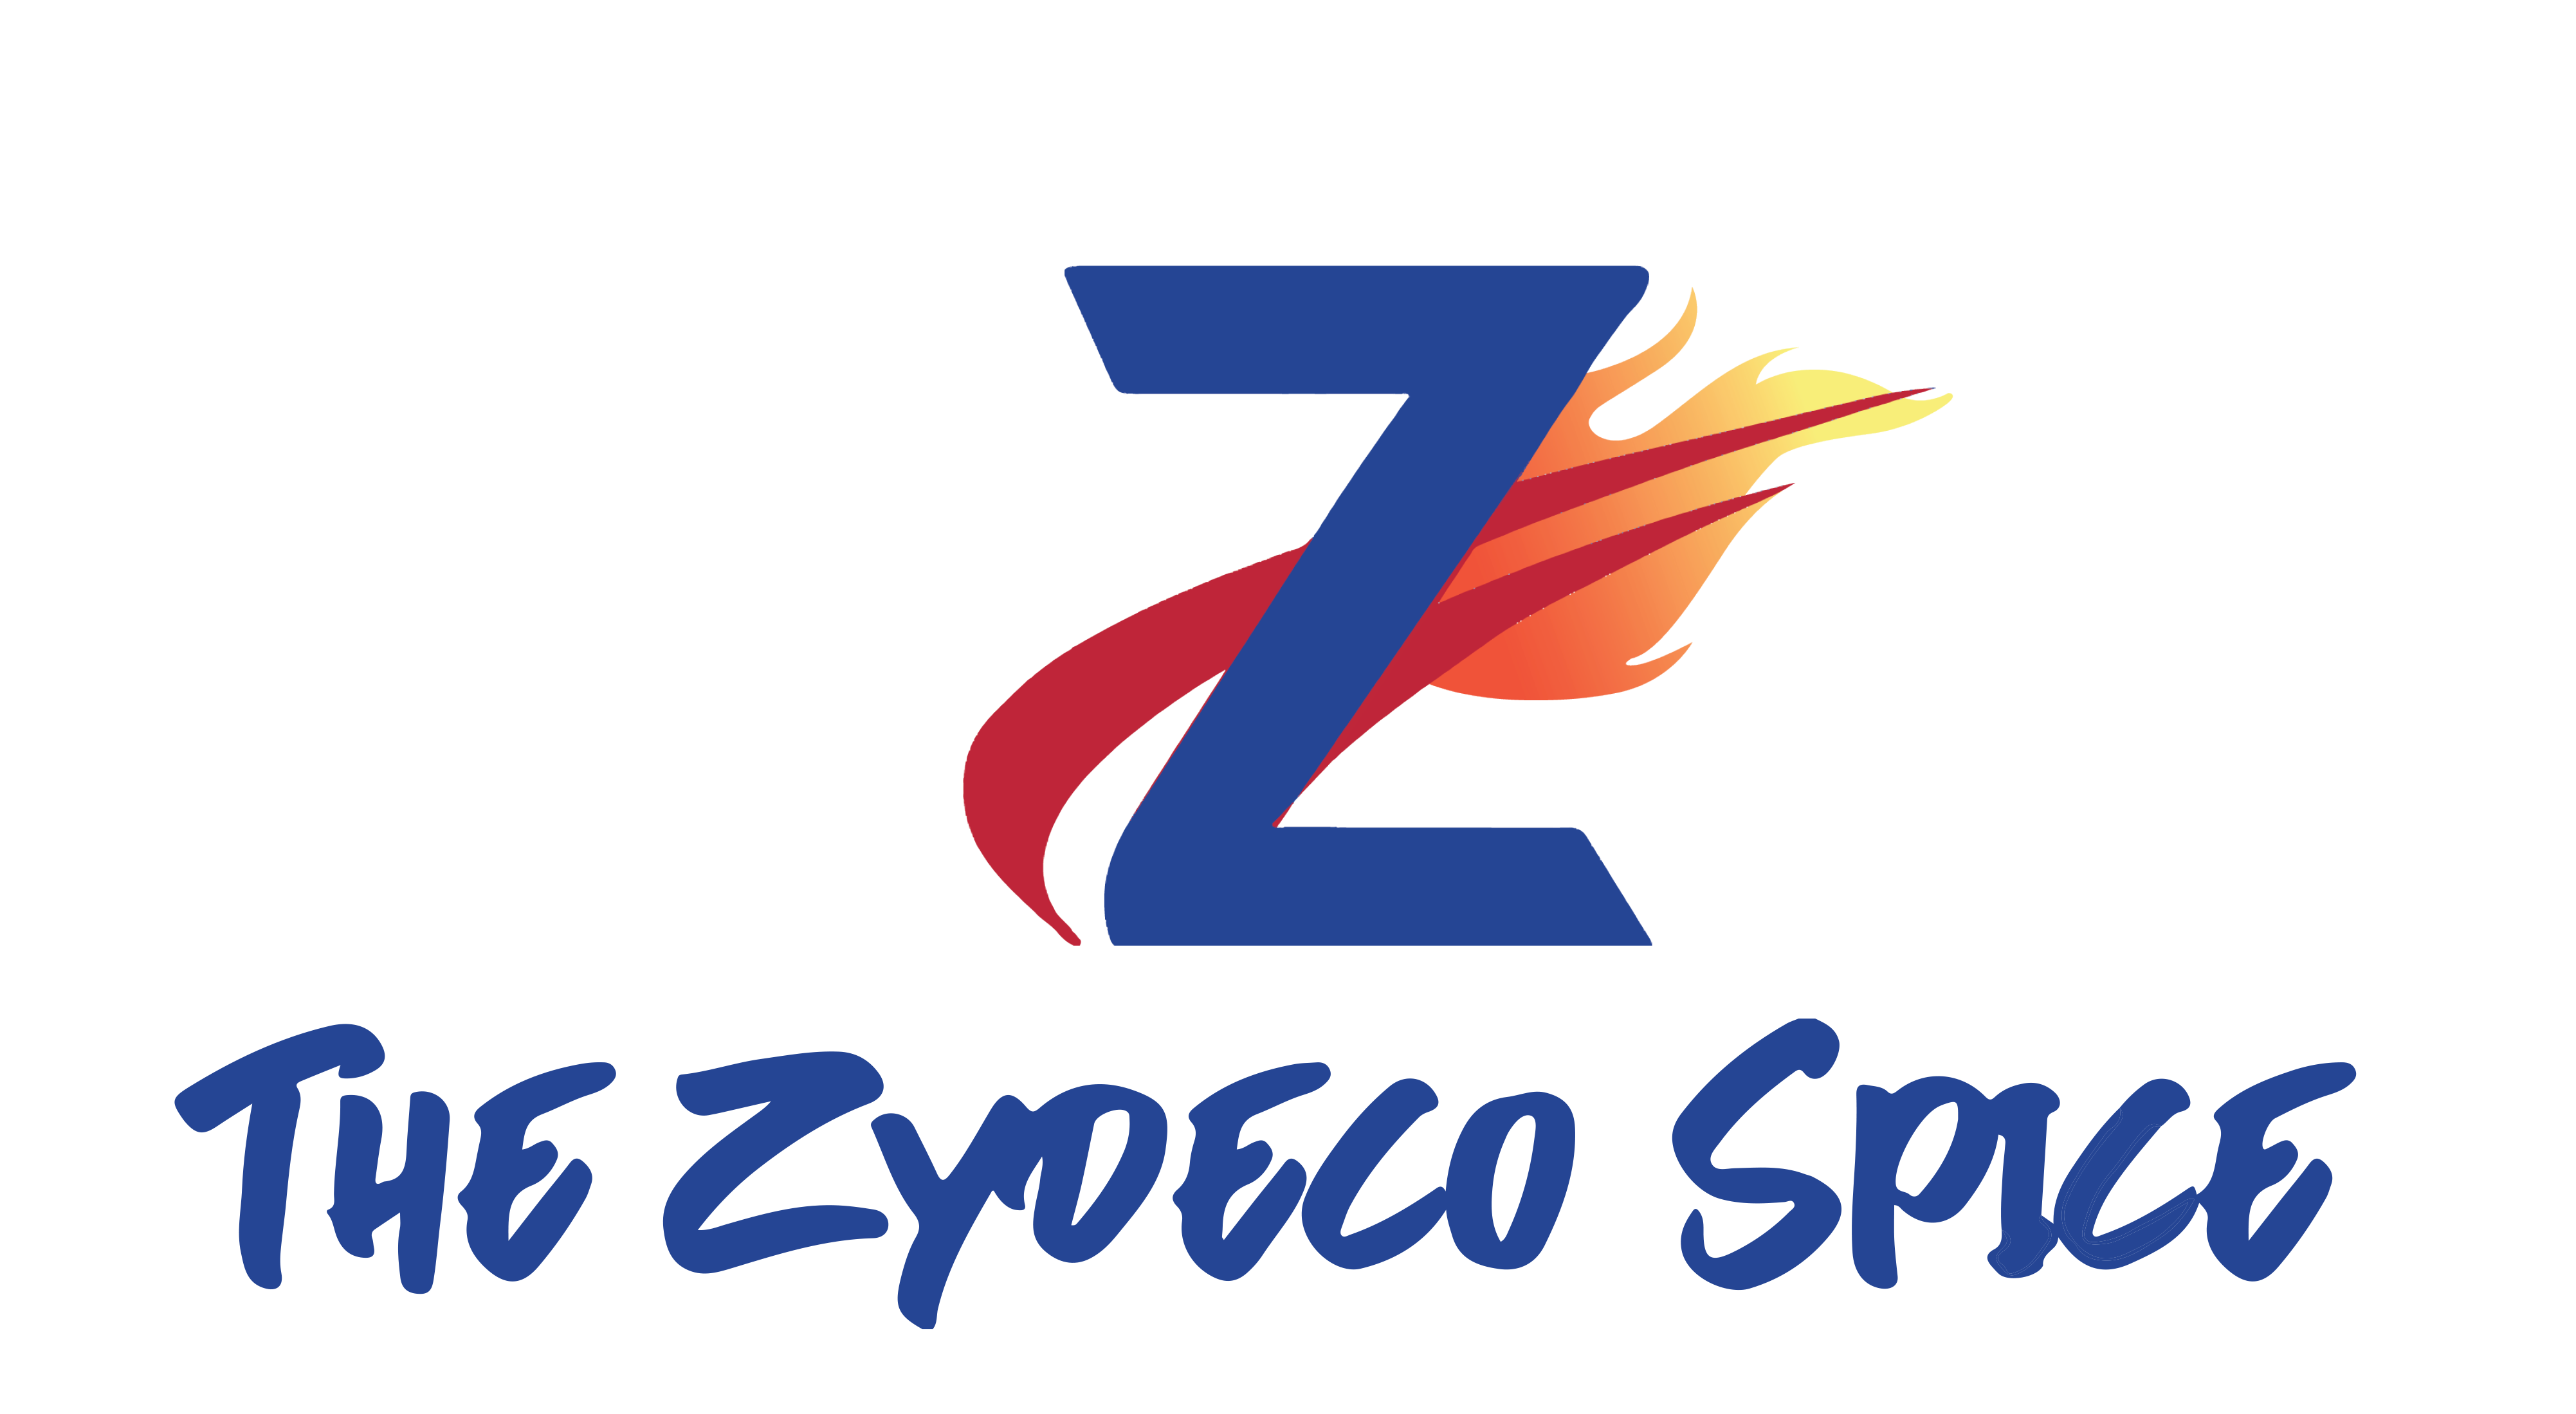 Zydeco Spice